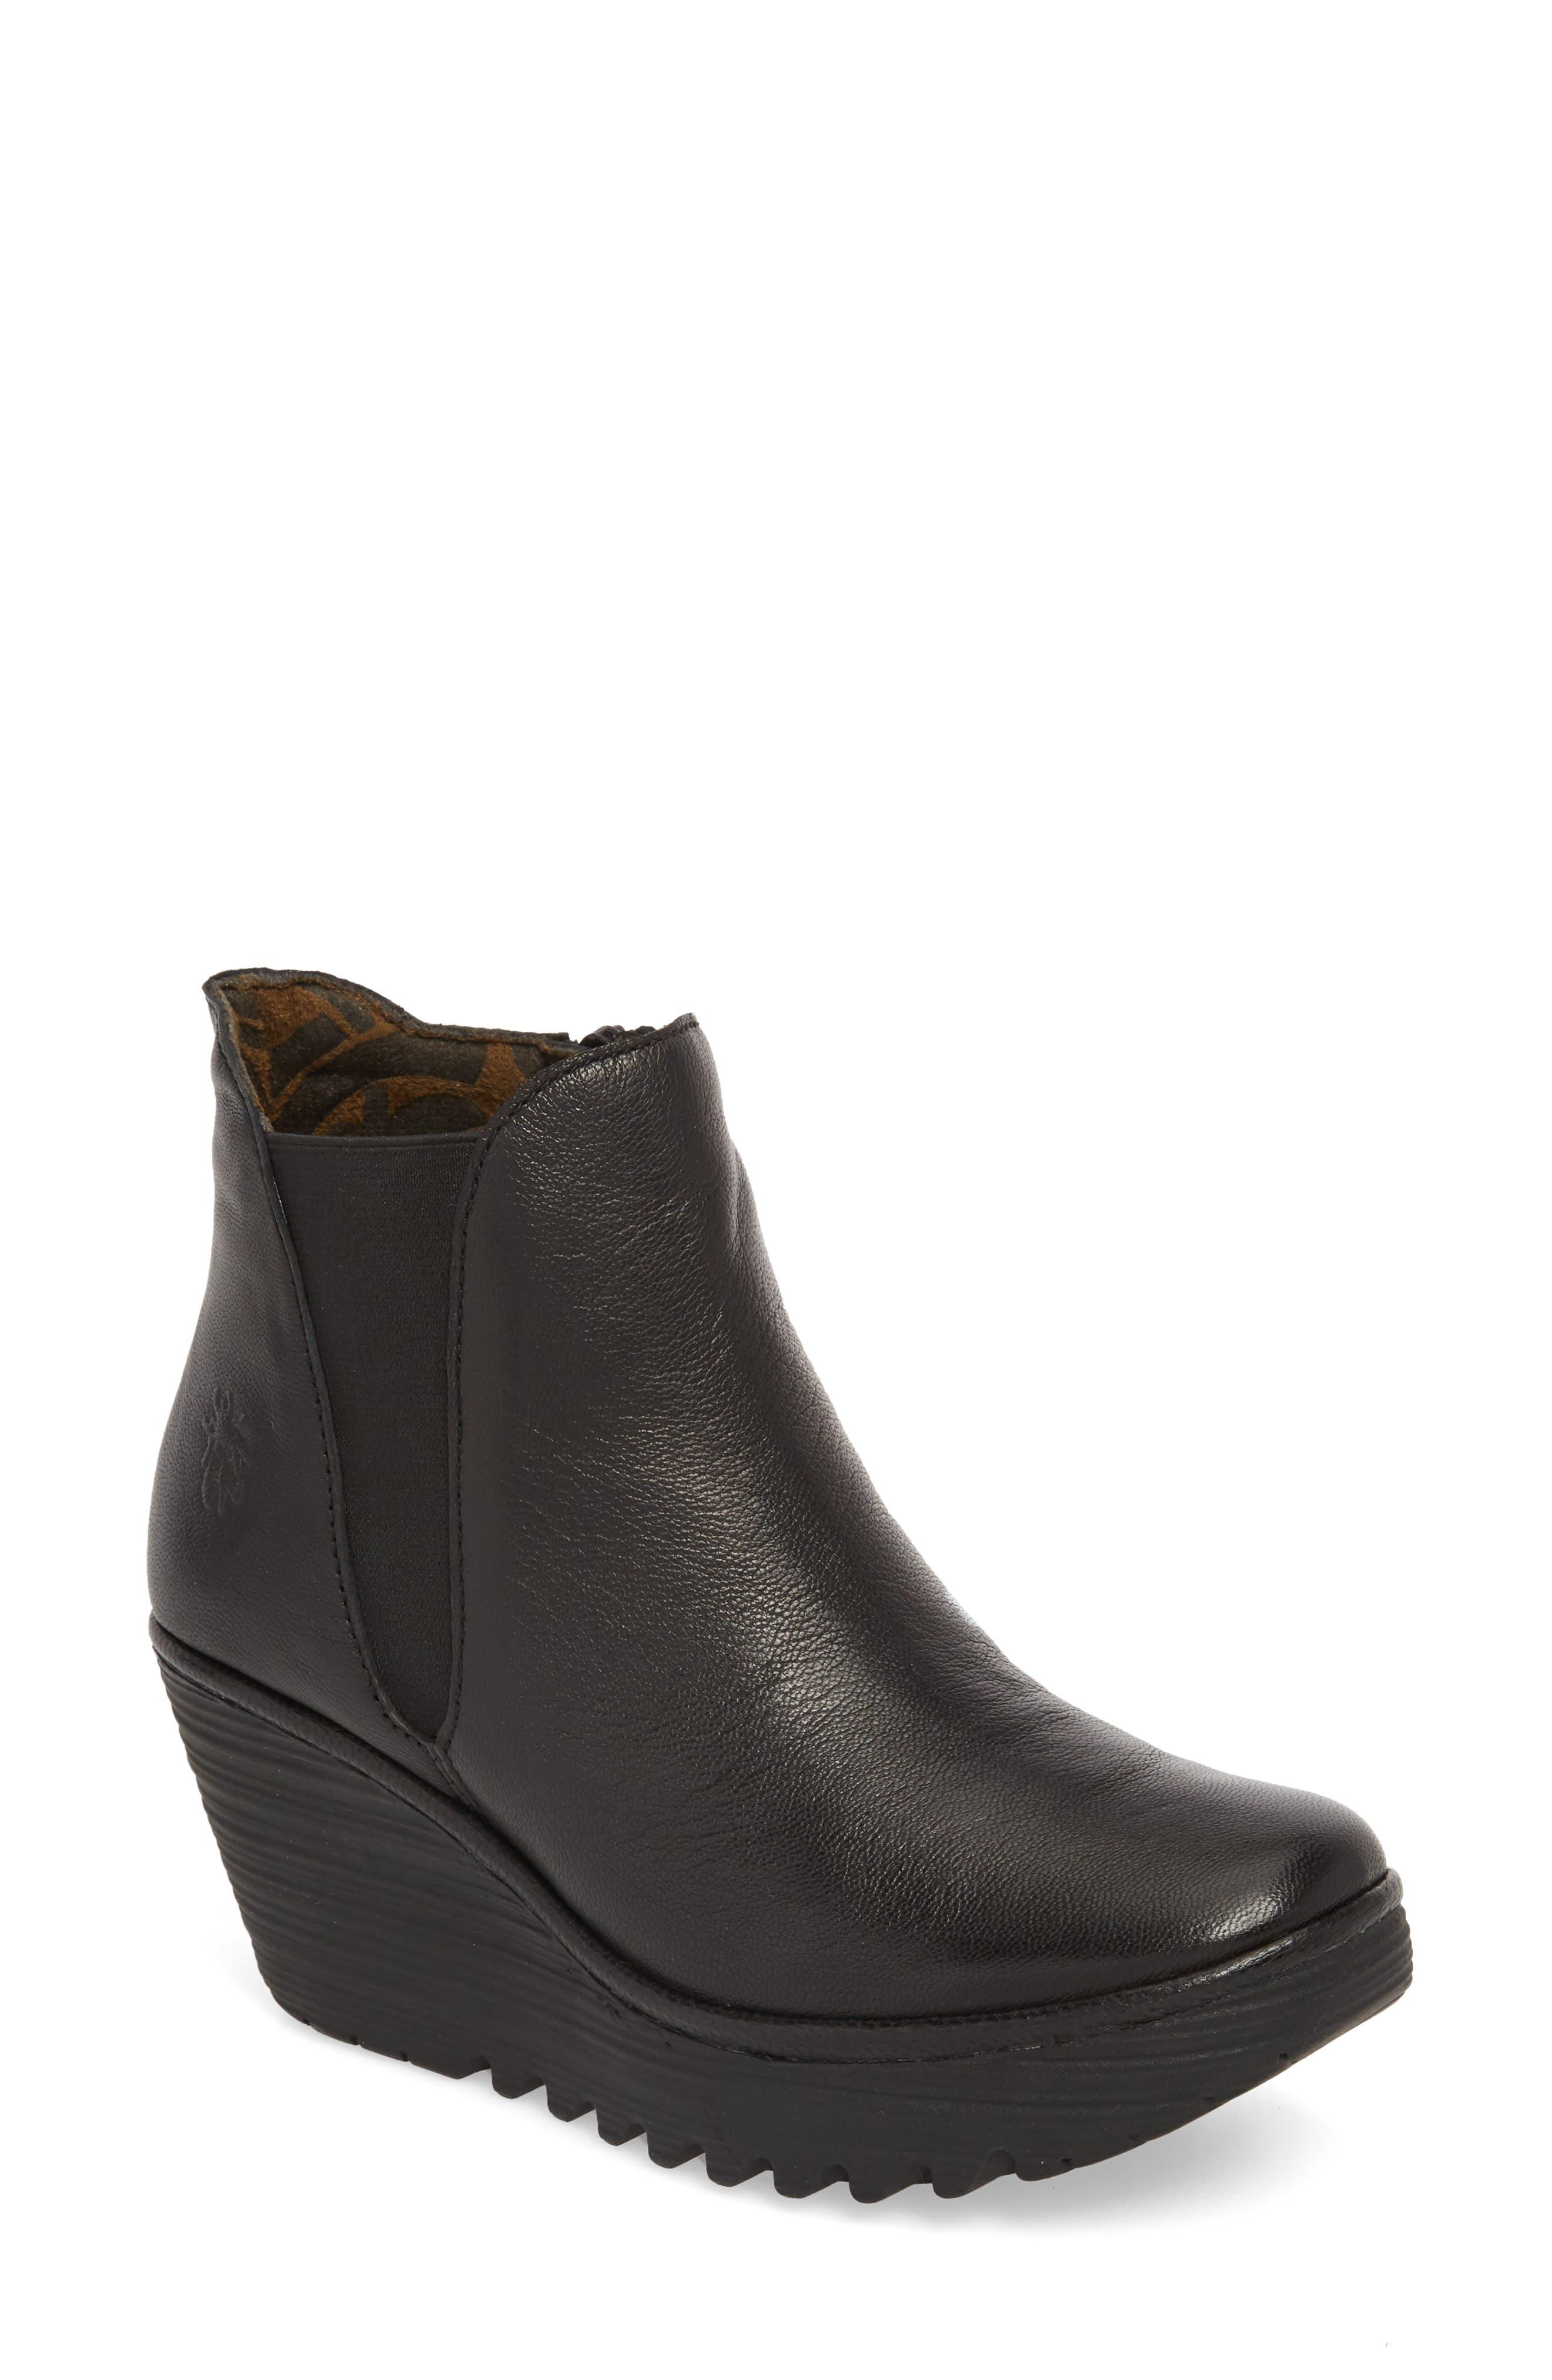 Yozo Wedge Boot,                         Main,                         color, BLACK